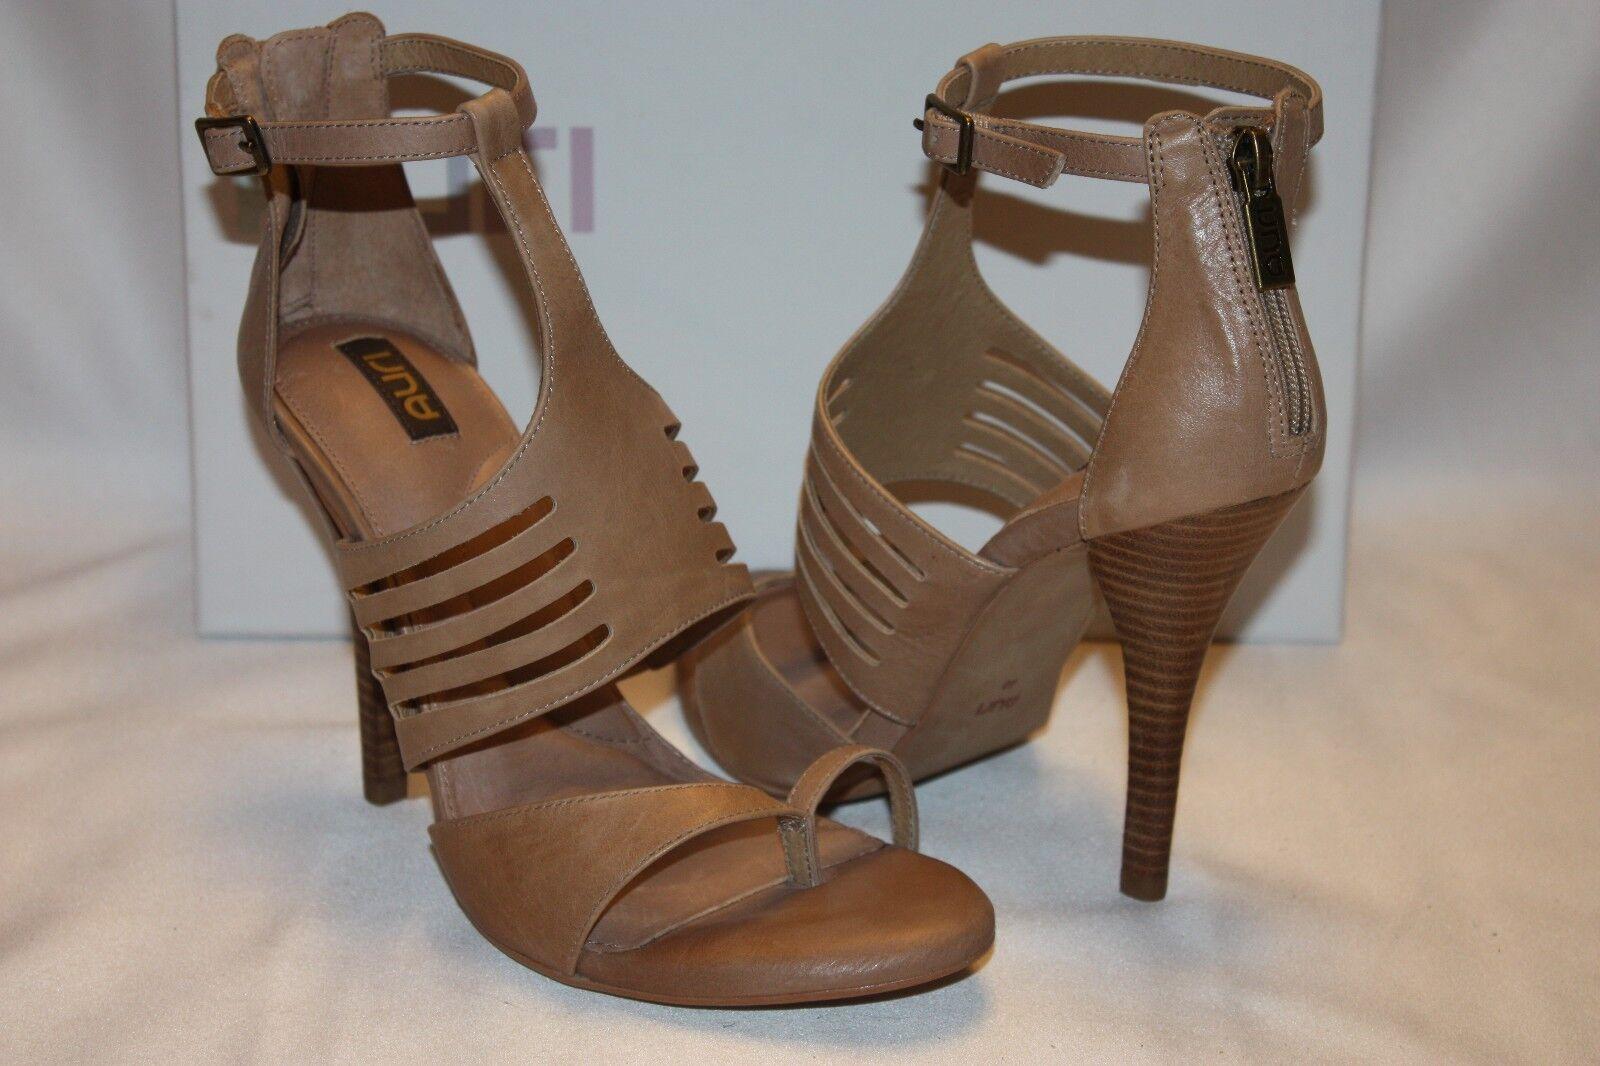 NEU  NIB  AURI Natural Tan Leder KRISTEN Ankle Strap Sandale Heels Sz 10 180